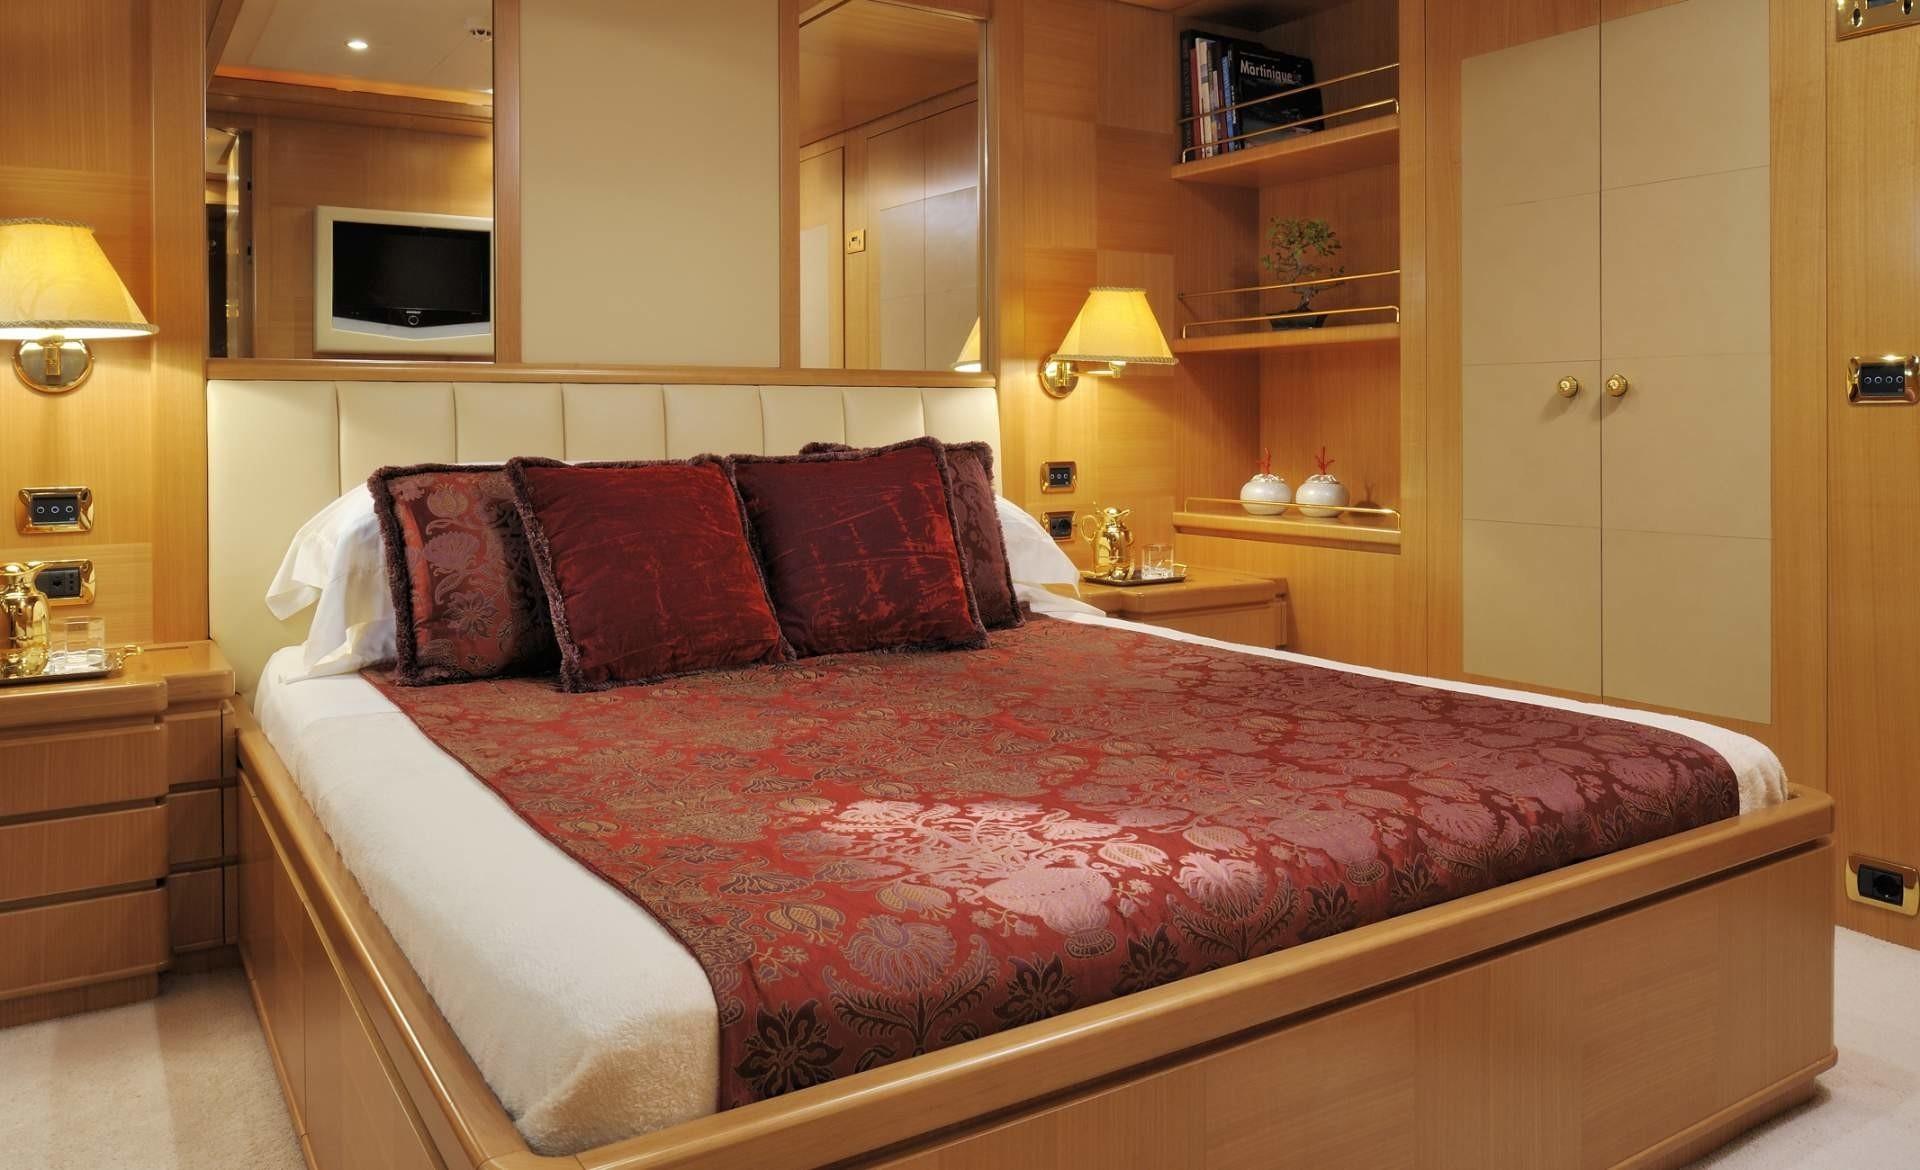 Guest's Cabin Aboard Yacht OASIS